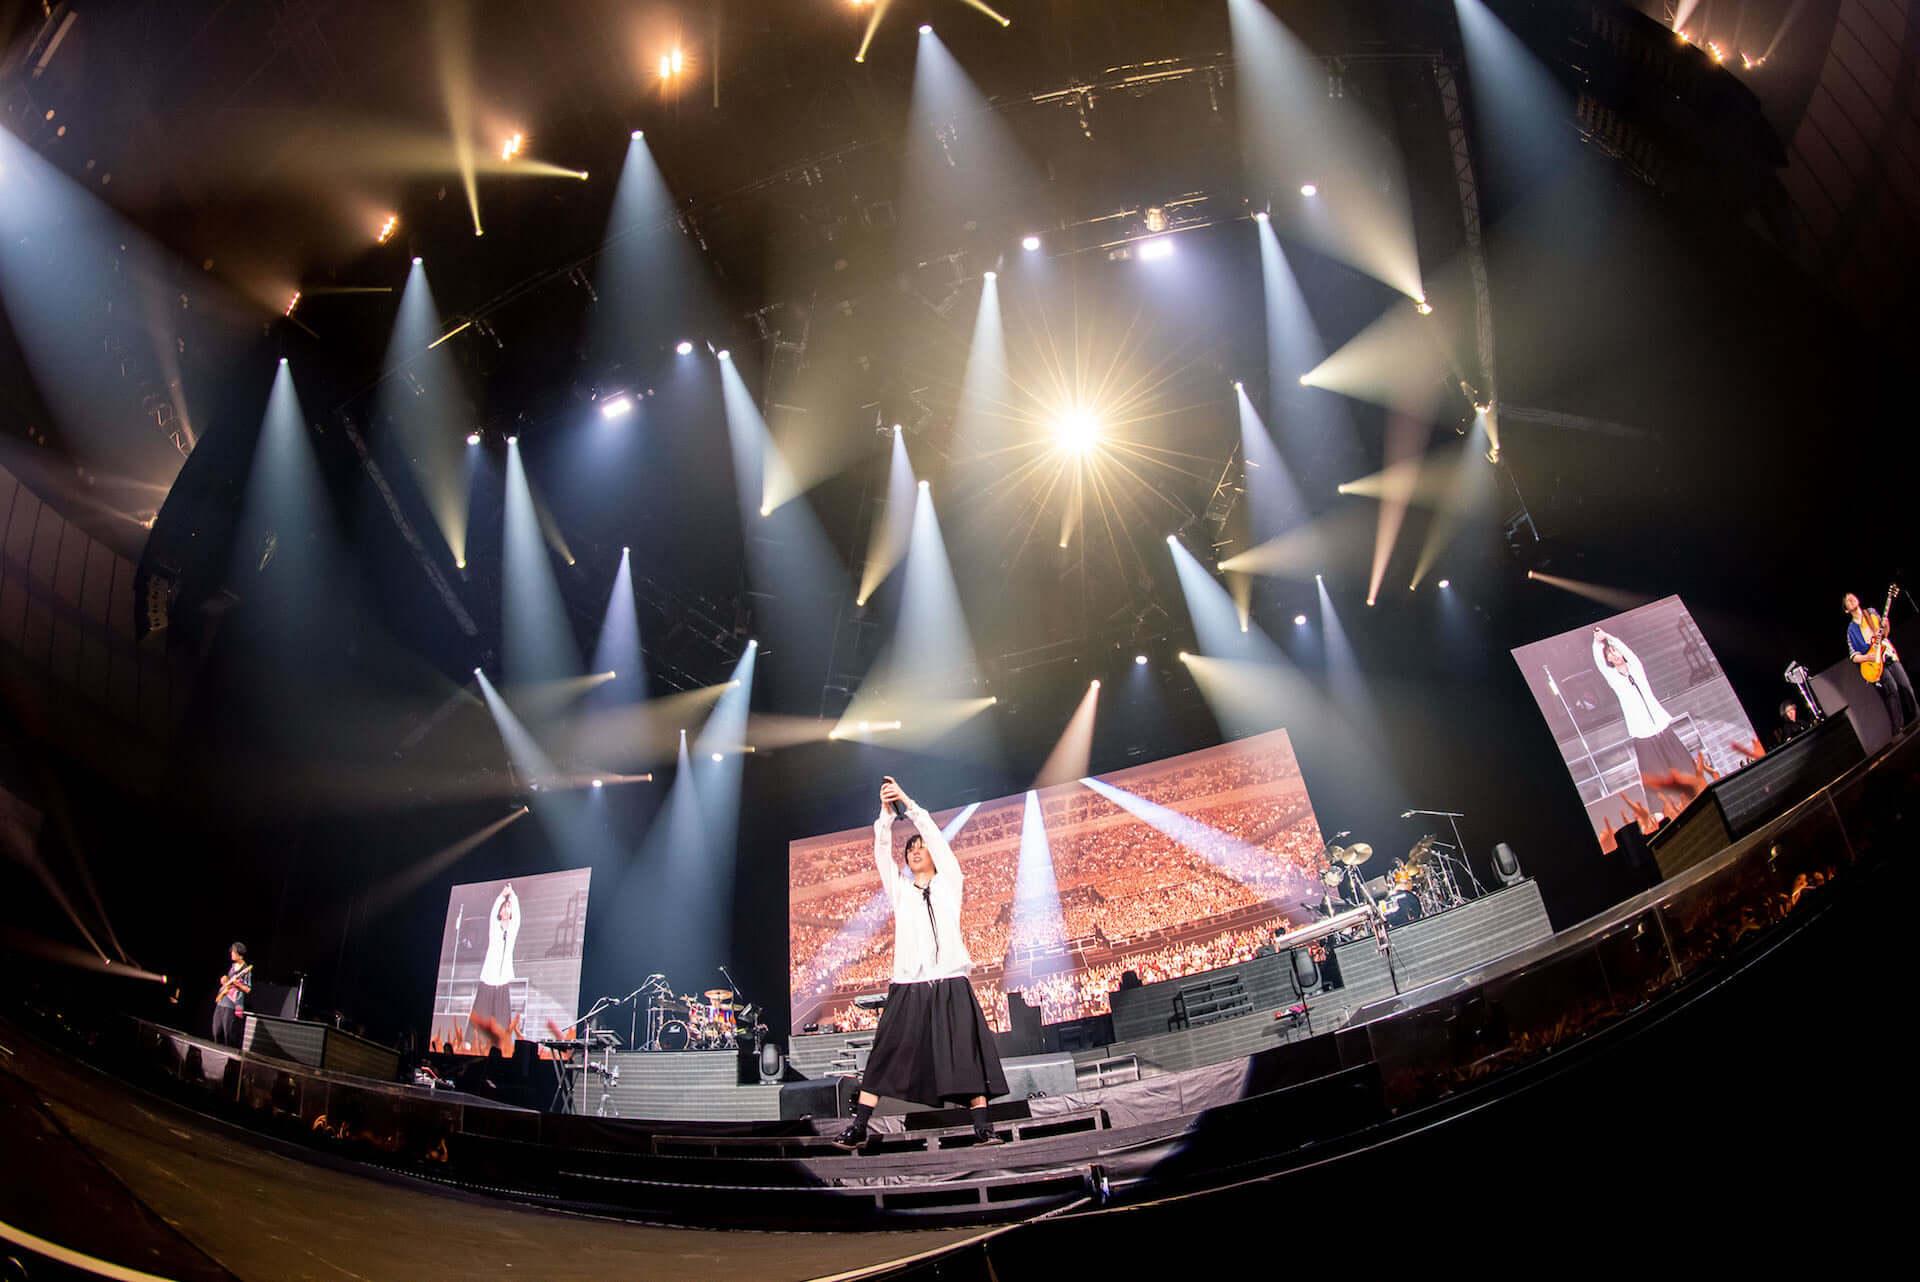 RADWIMPS横浜アリーナ公演のライブ写真が公開!<ANTI ANTI GENERATION TOUR 2019>レポート music190830_radwimps_live_4-1920x1282